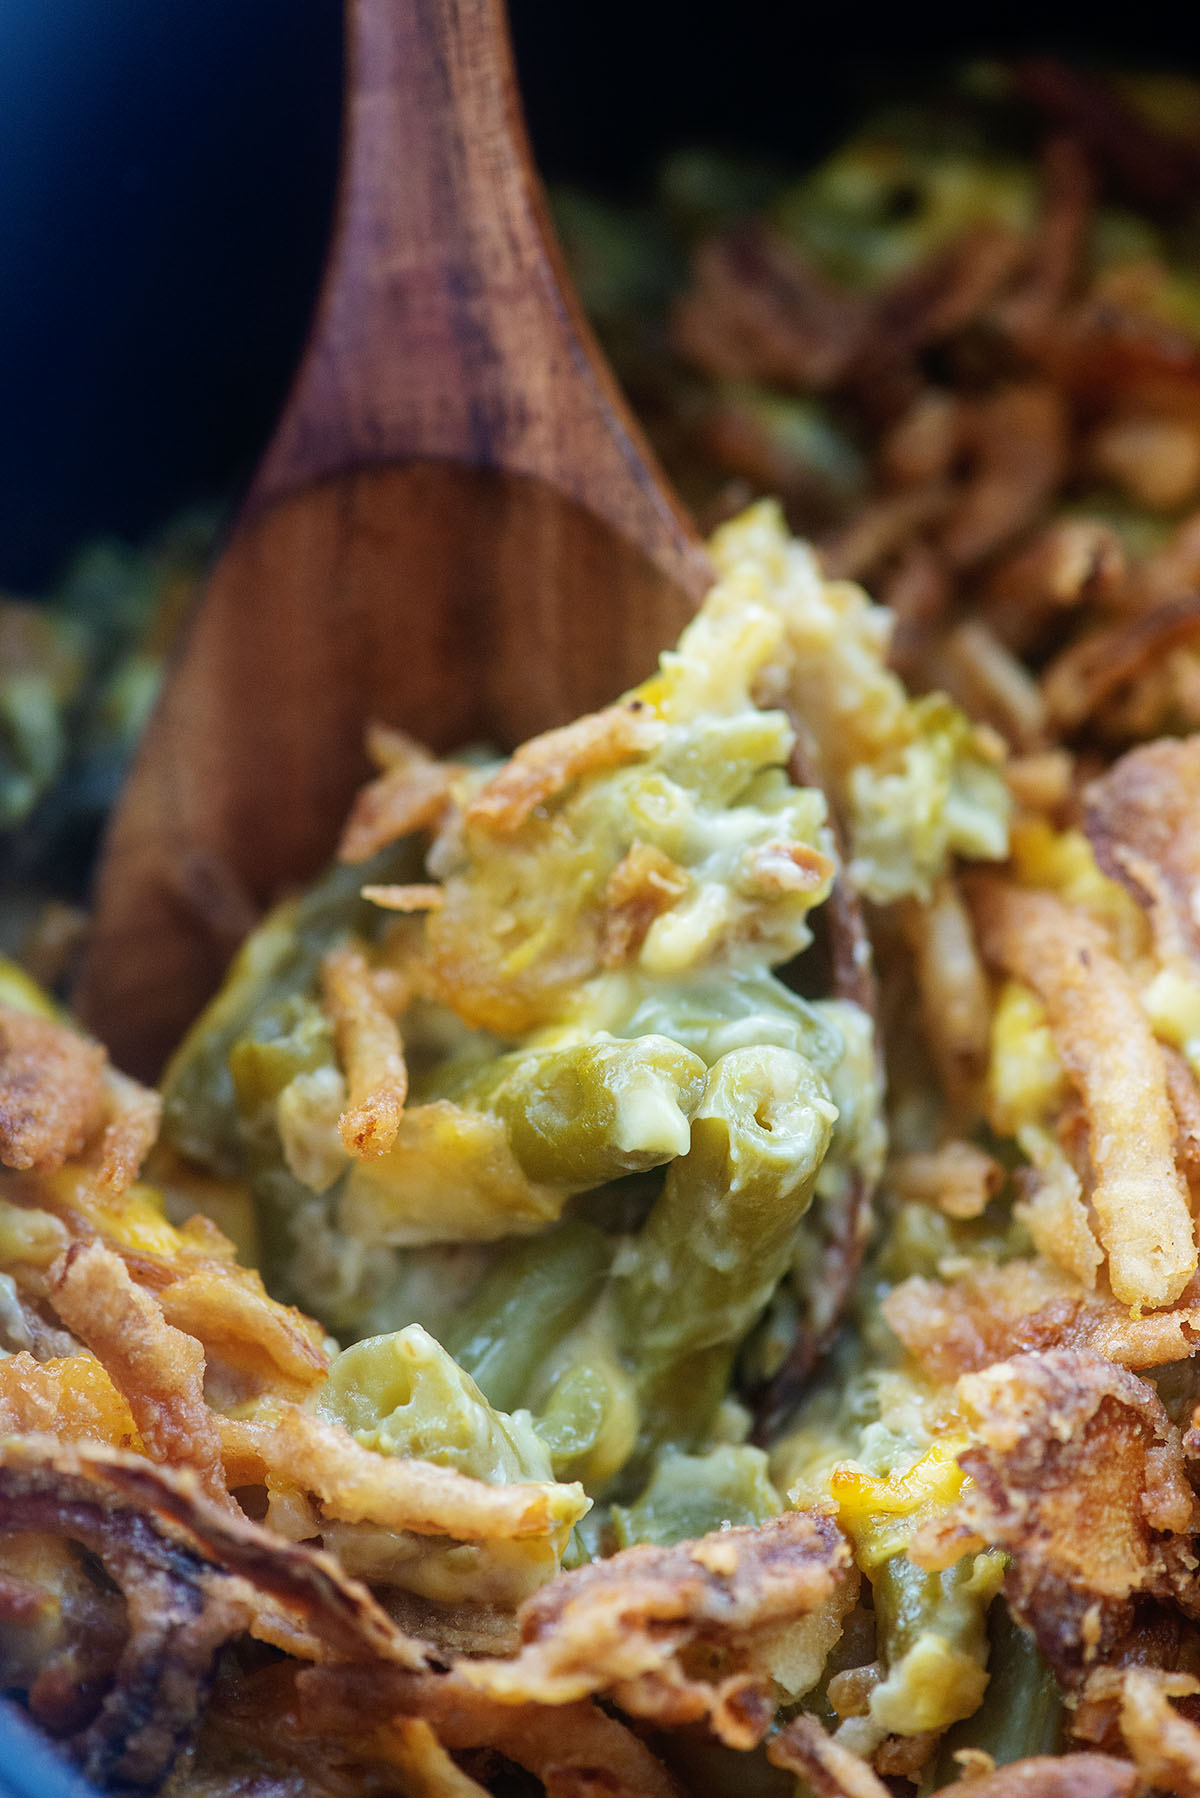 A wooden spoon dipping into green bean casserole